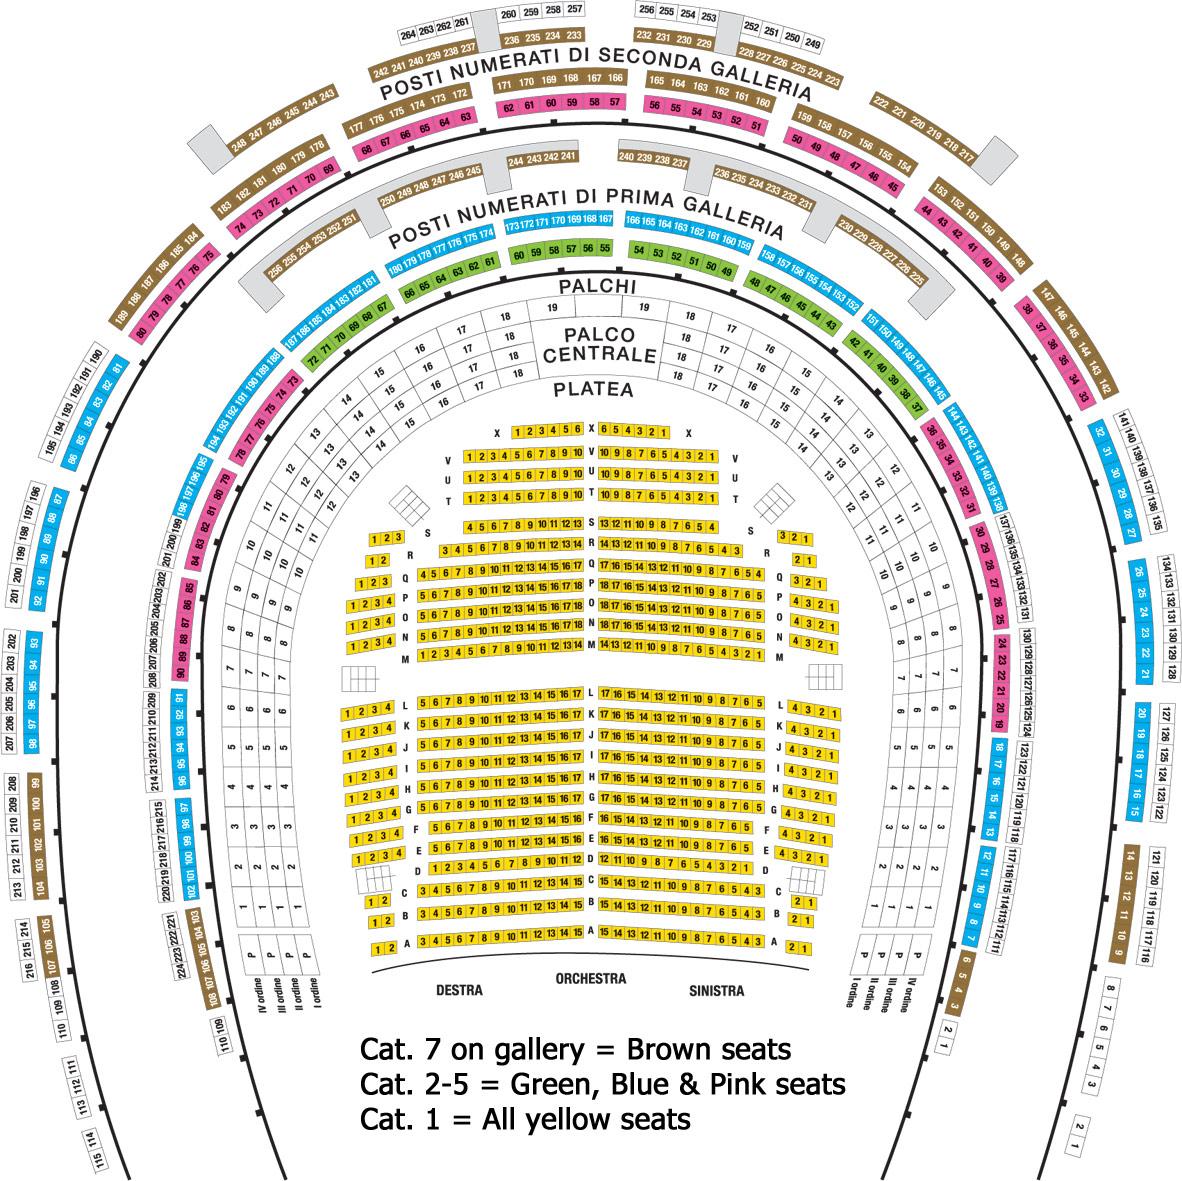 Billets Pour Teatro Alla Scala Billetsmilan Fr